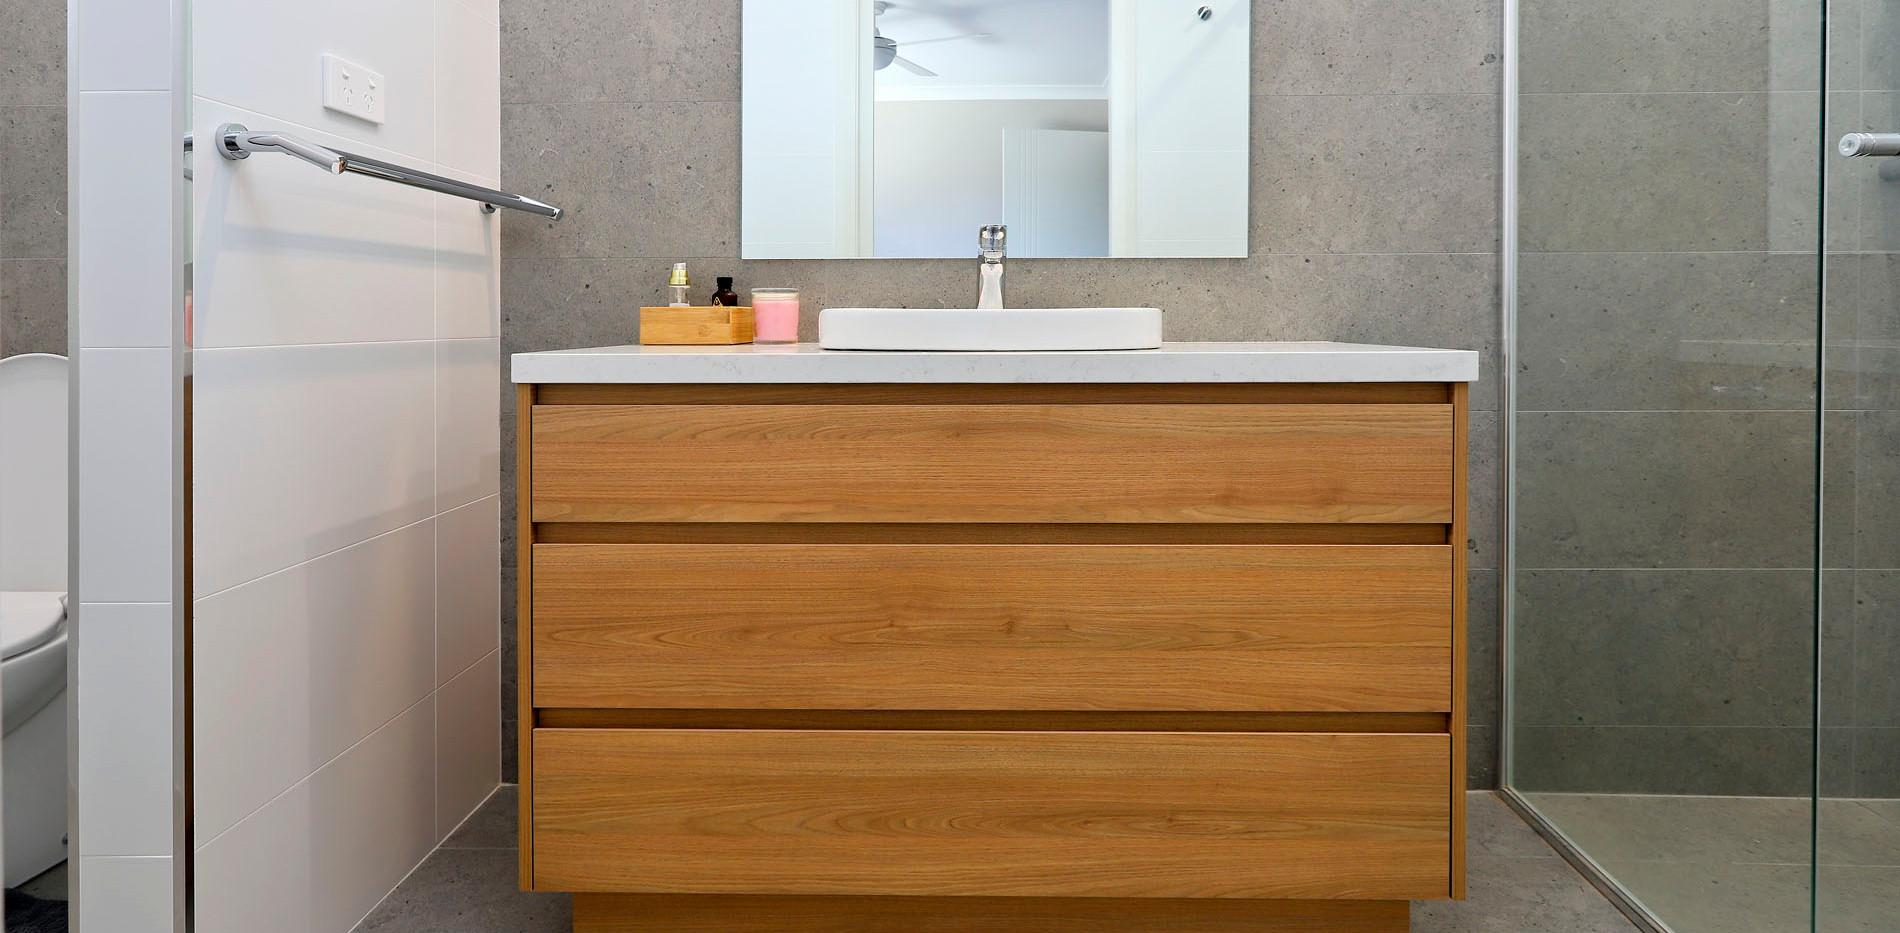 Small Bathrooms-Powder Rooms (14)